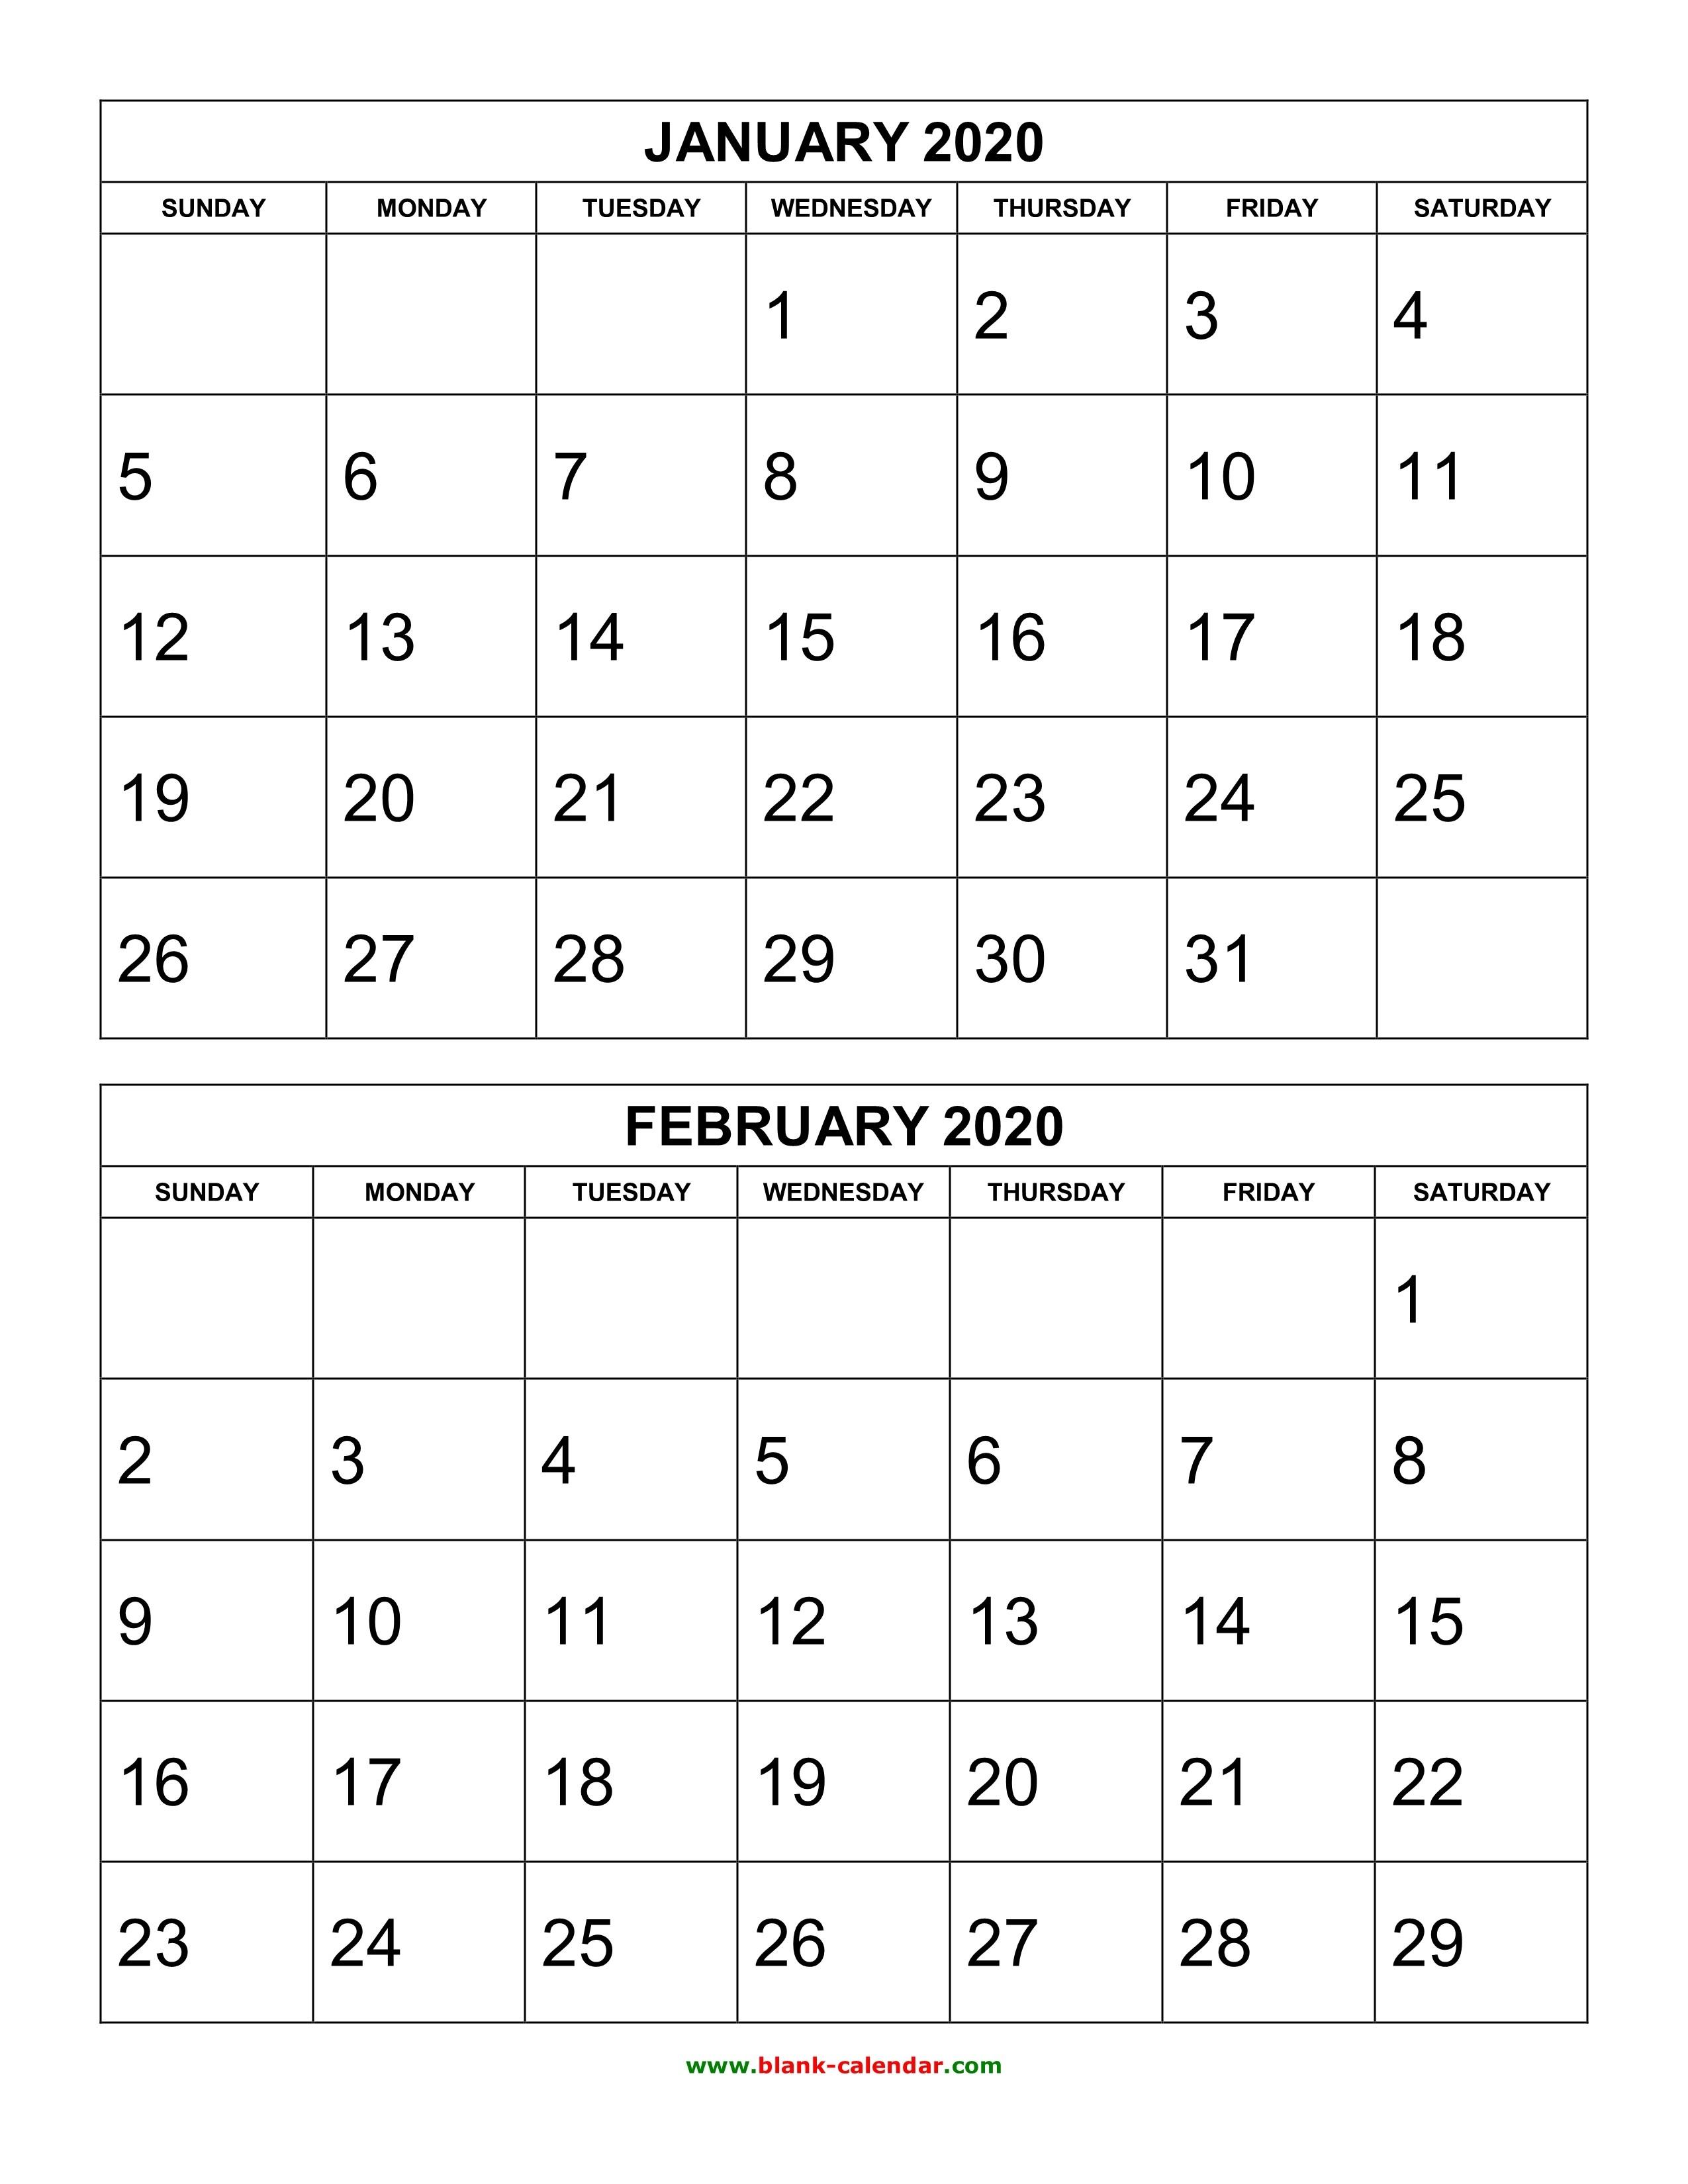 Free Download Printable Calendar 2020, 2 Months Per Page, 6-Printable 2 Page Monthly Calendar 2020 Free